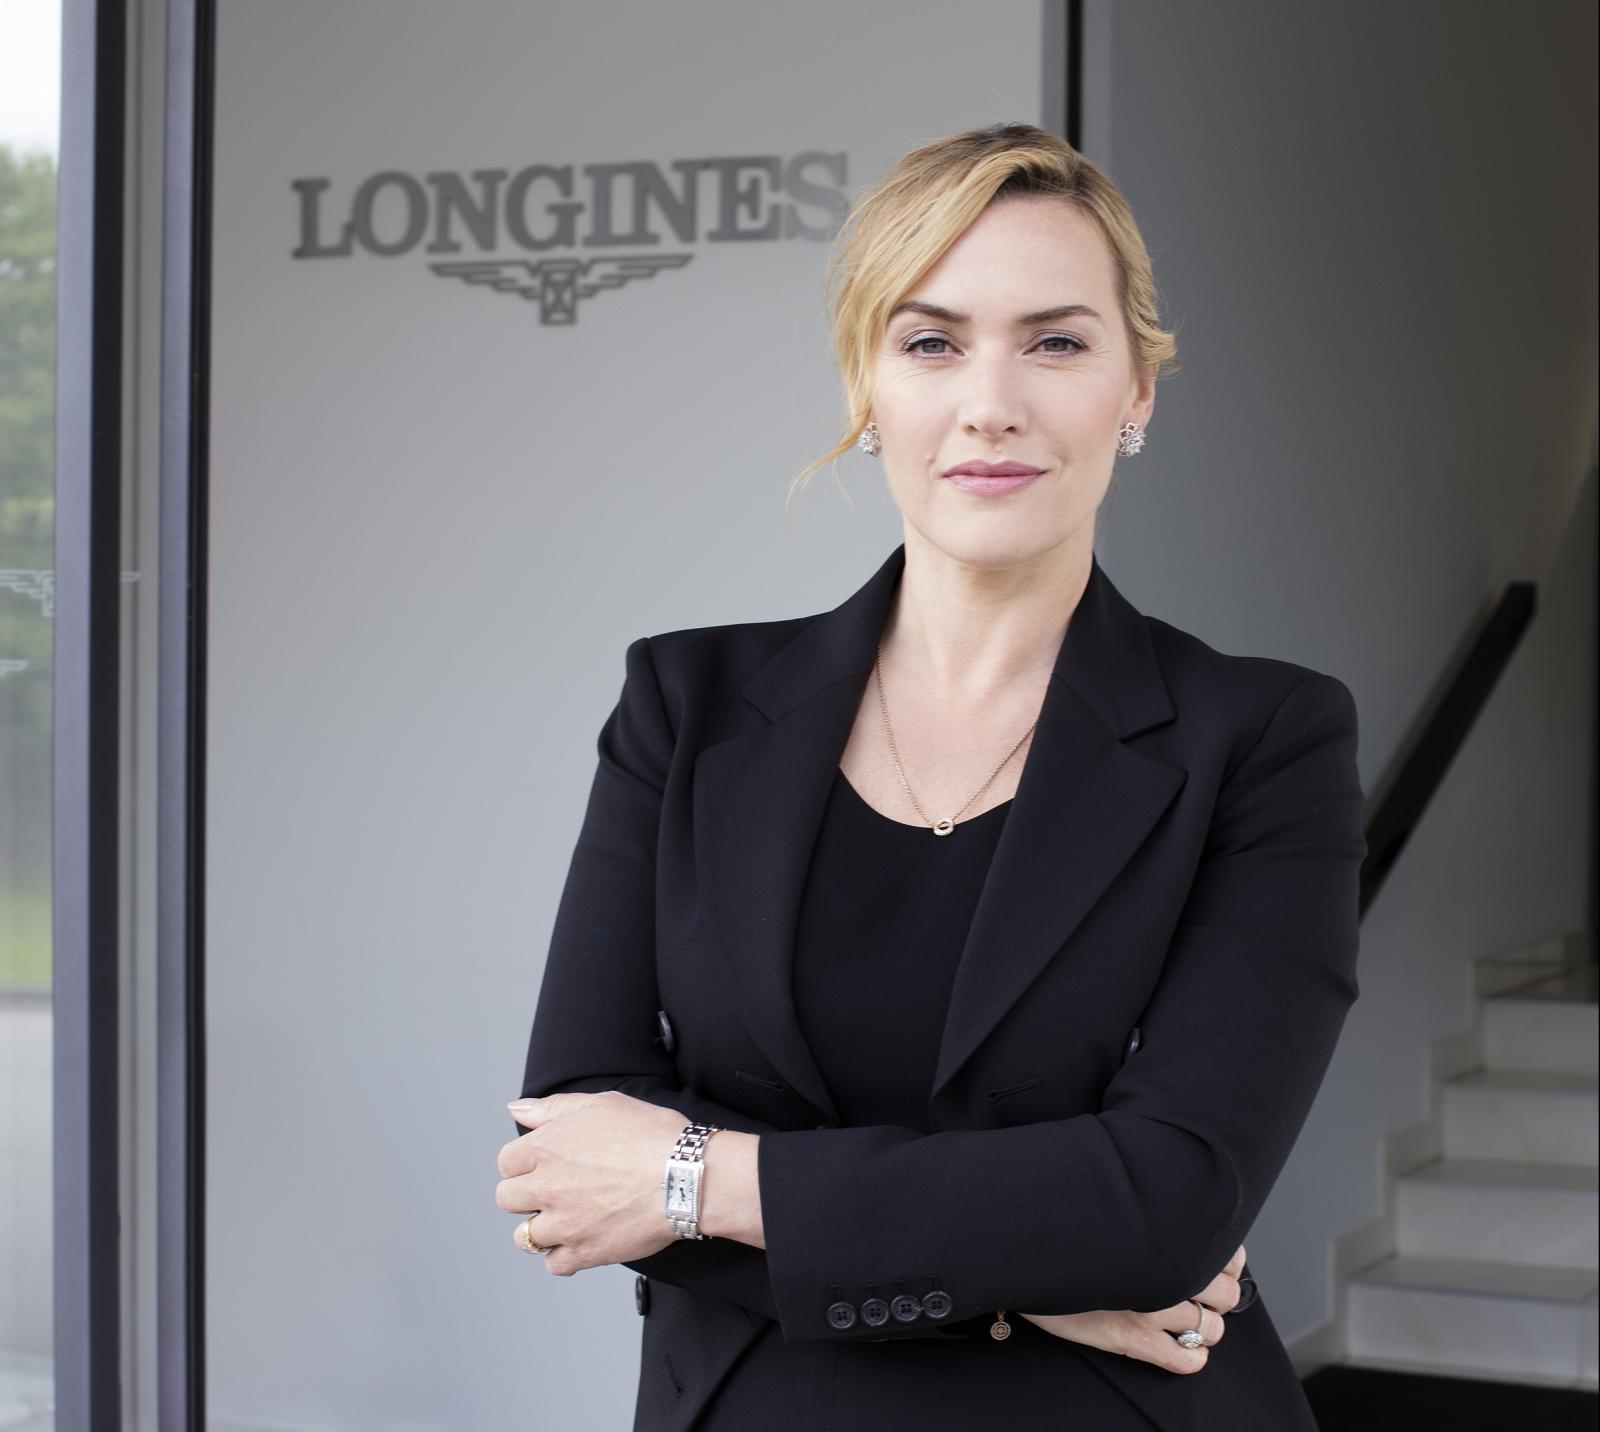 Longines Ambassador Kate Winslet